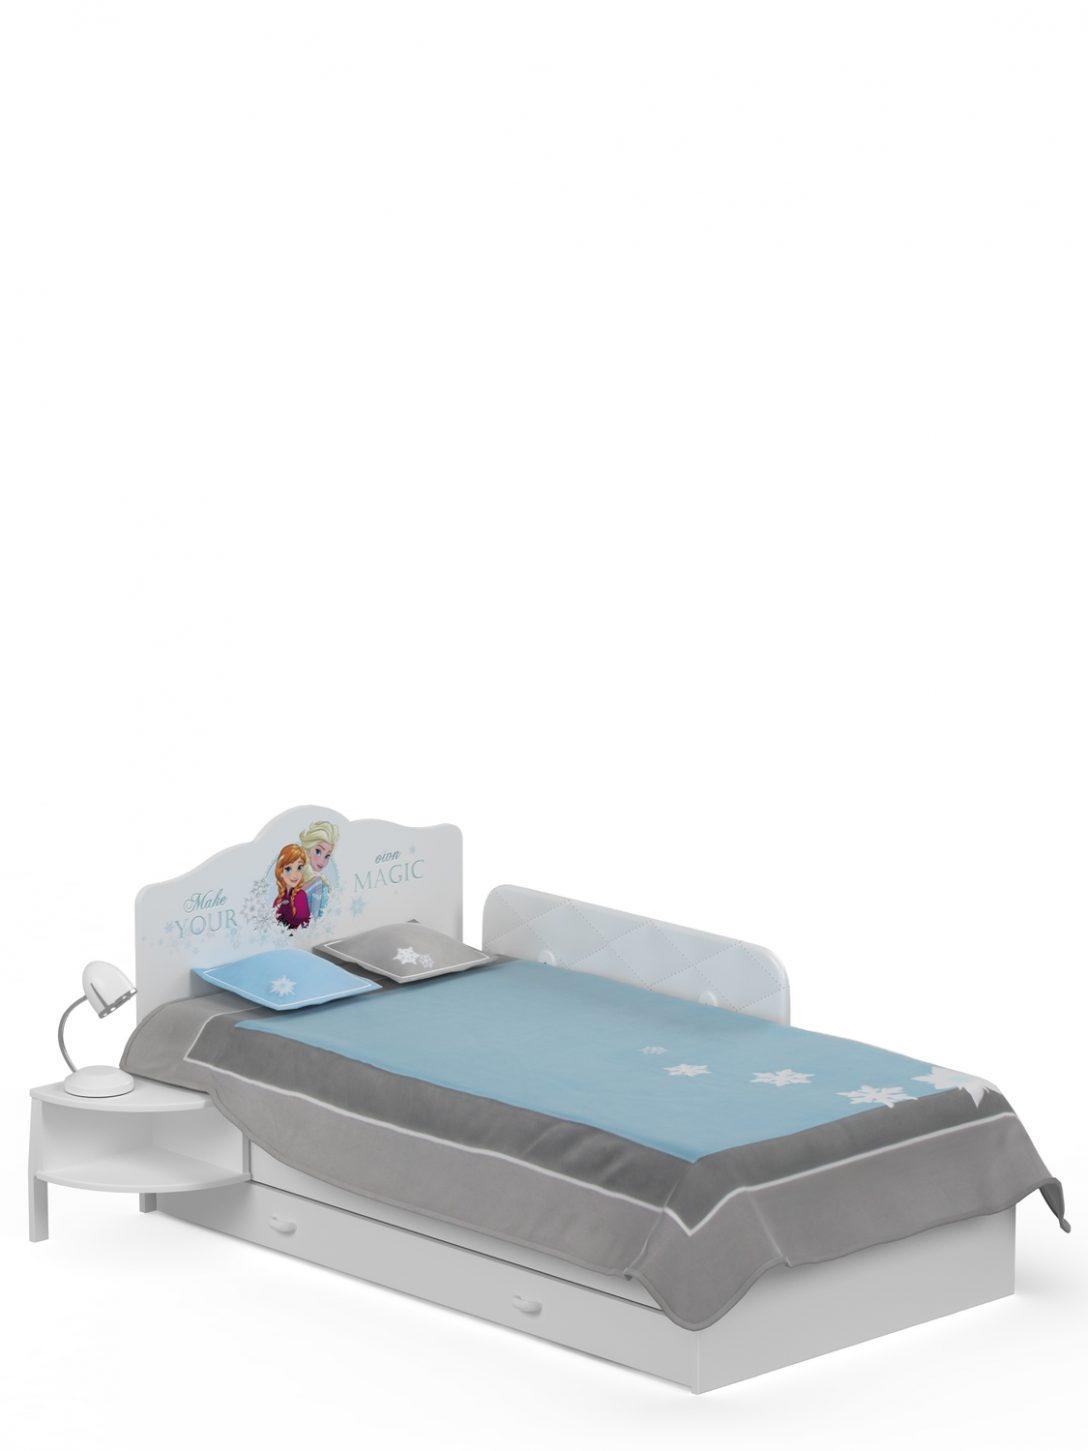 Large Size of Bett 120x200 Frozen Meblik Teenager Betten Düsseldorf Outlet 100x200 140x200 Weiß Mit Rückenlehne Komplett 140x220 Selber Bauen Poco Bonprix Kingsize Bett 120x200 Bett